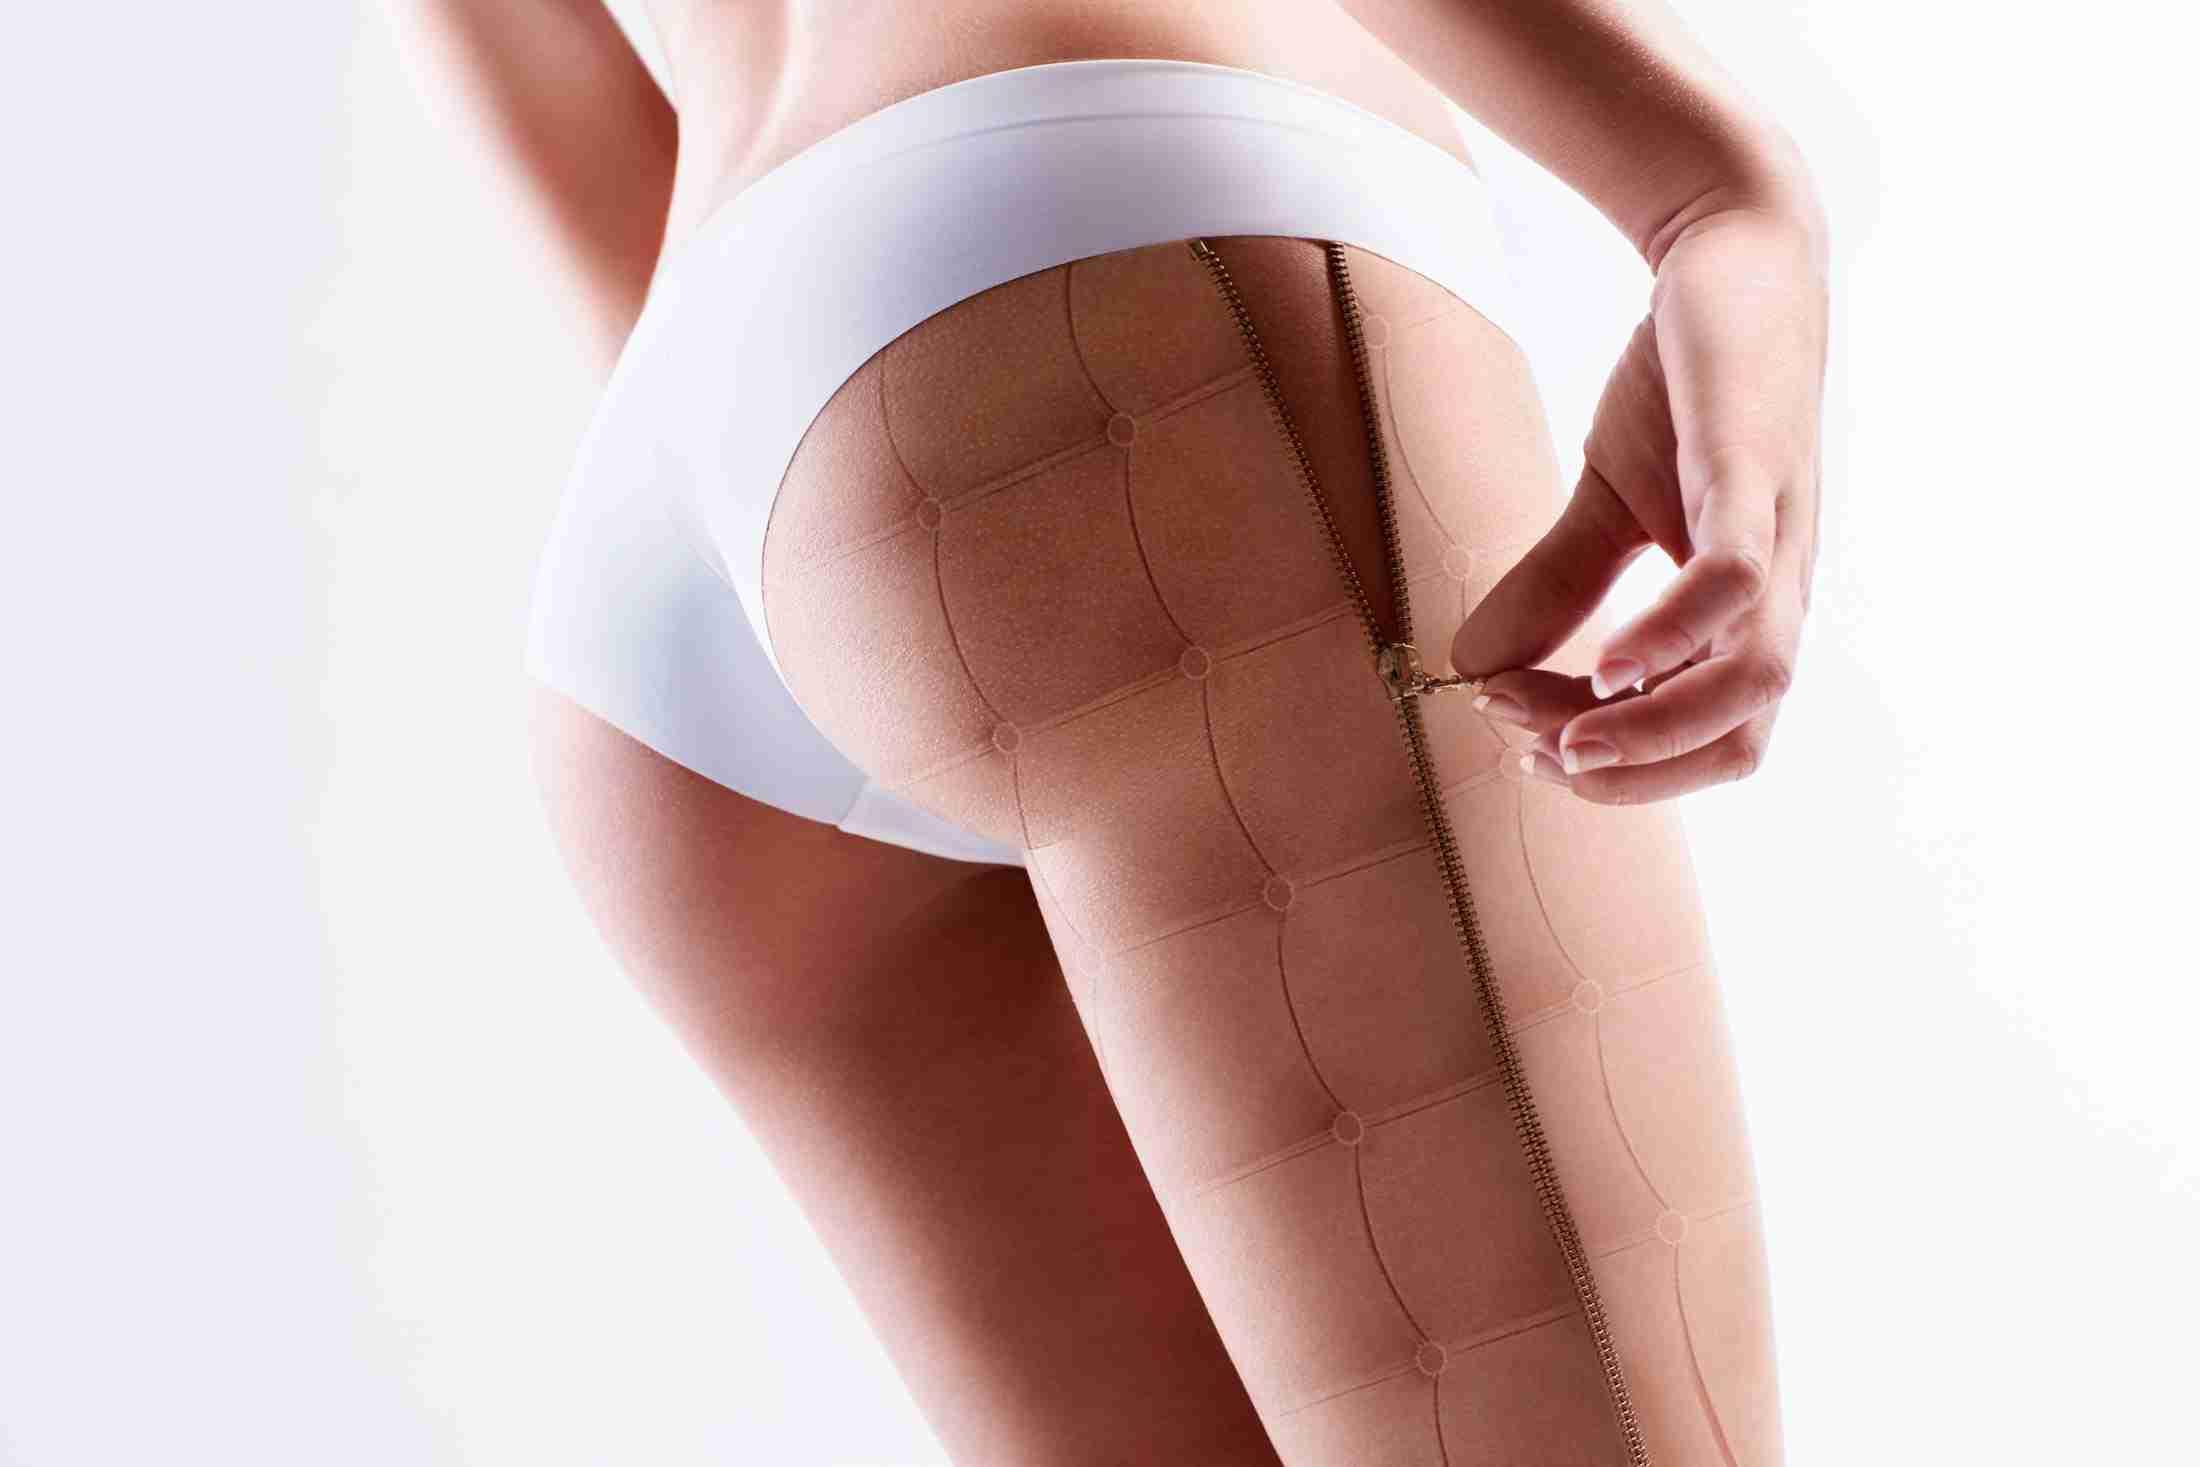 celulites nas pernas